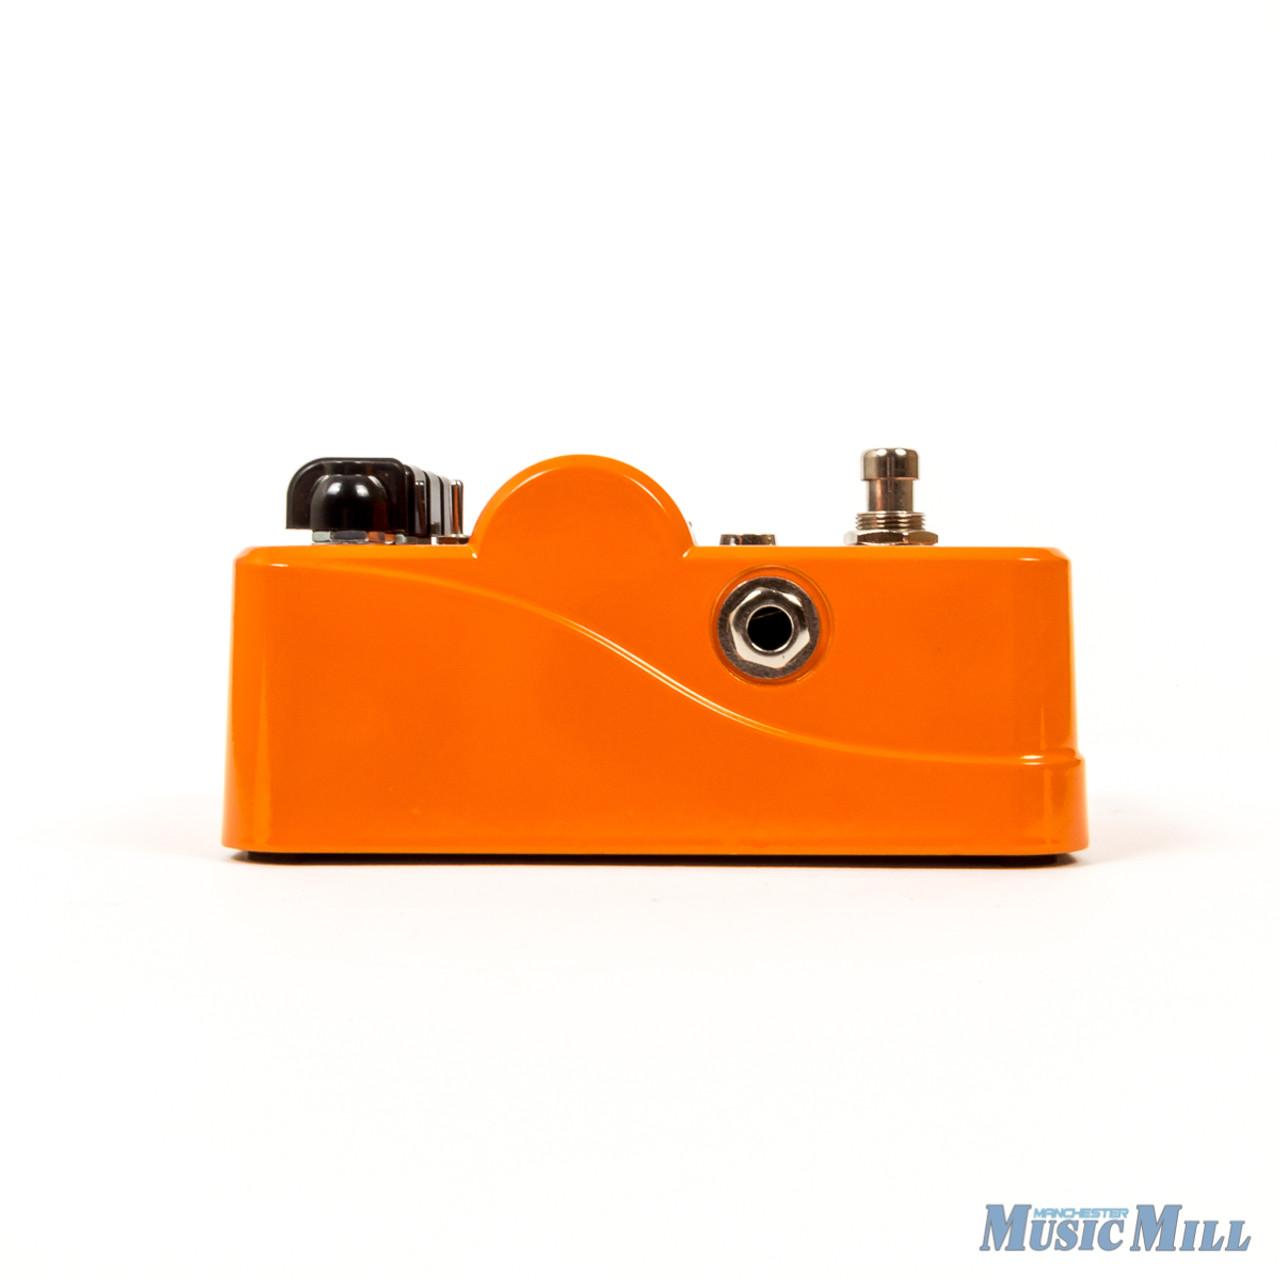 Vox Trike Fuzz Octave Effect Pedal Octaver Guitar Effects